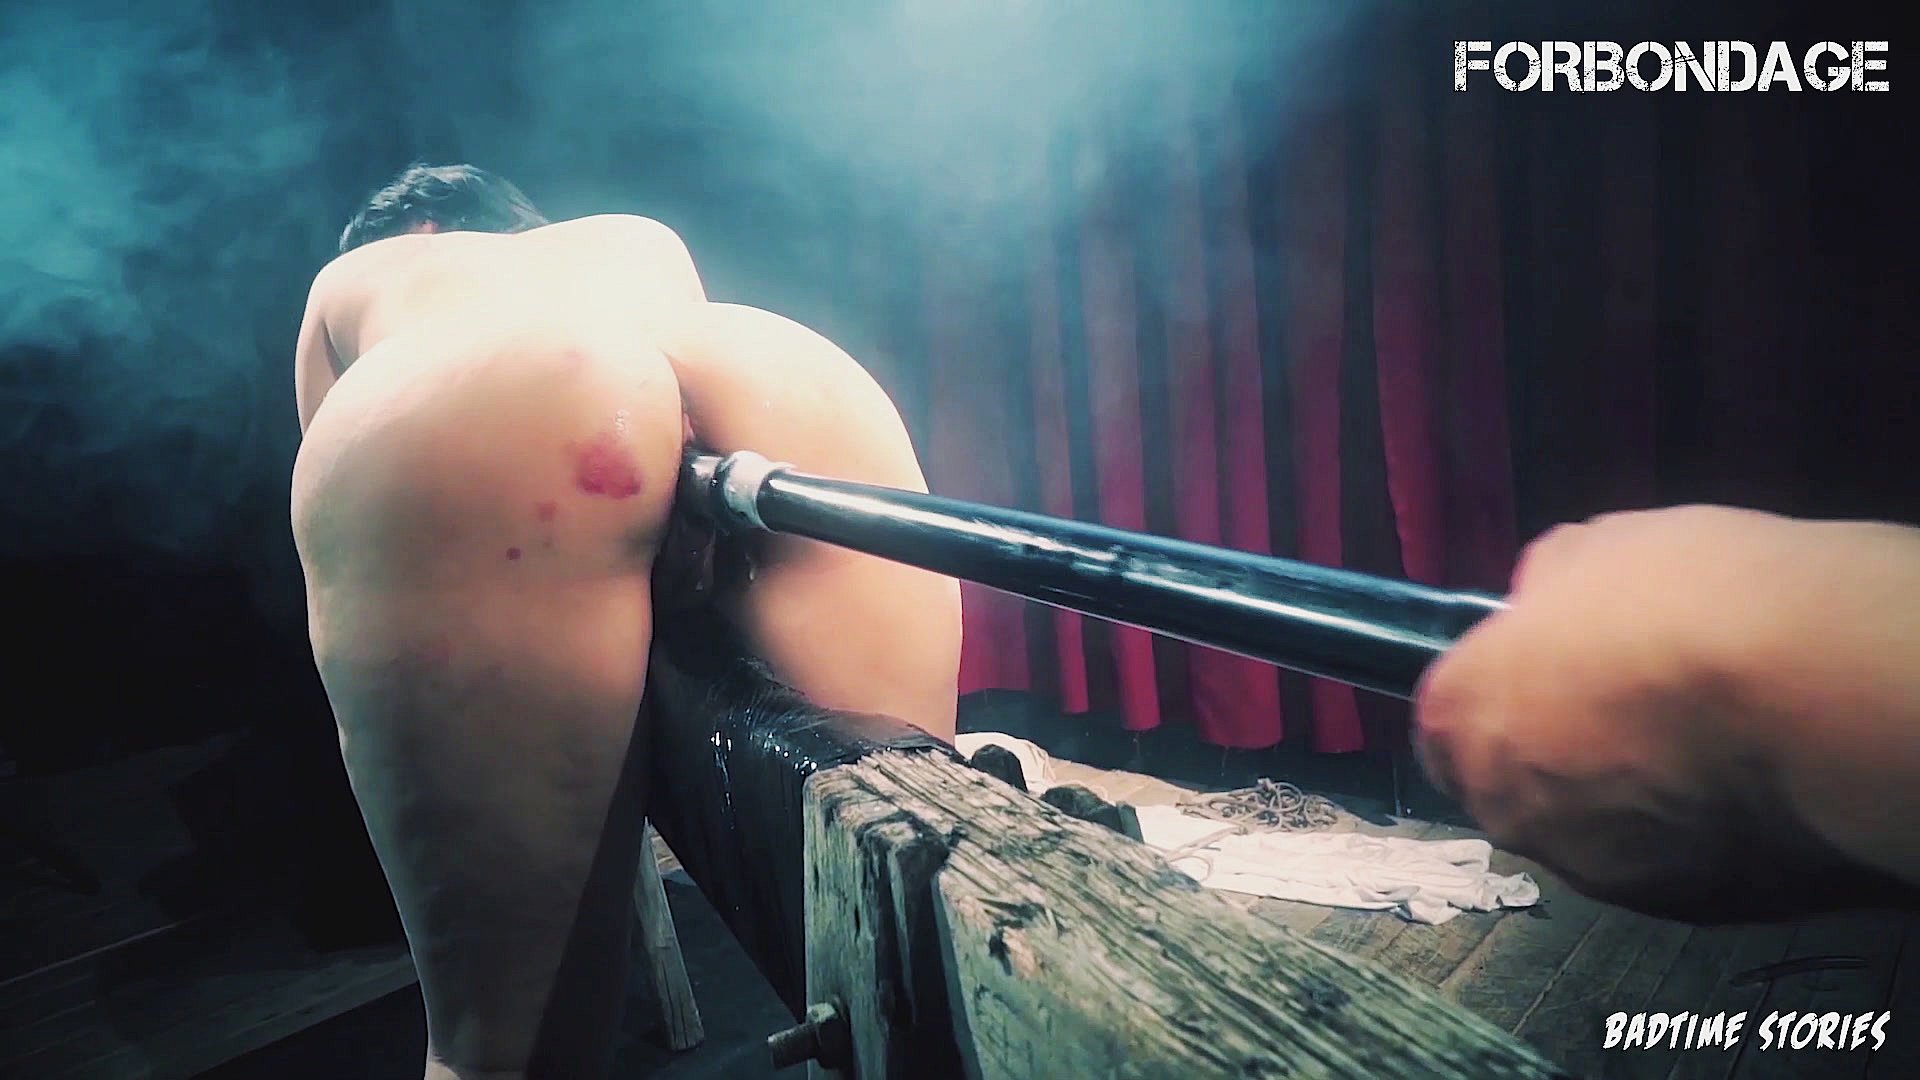 FORBONDAGE - Lullu Gun Submit To Her Master & Gets BDSM Pussy Punished